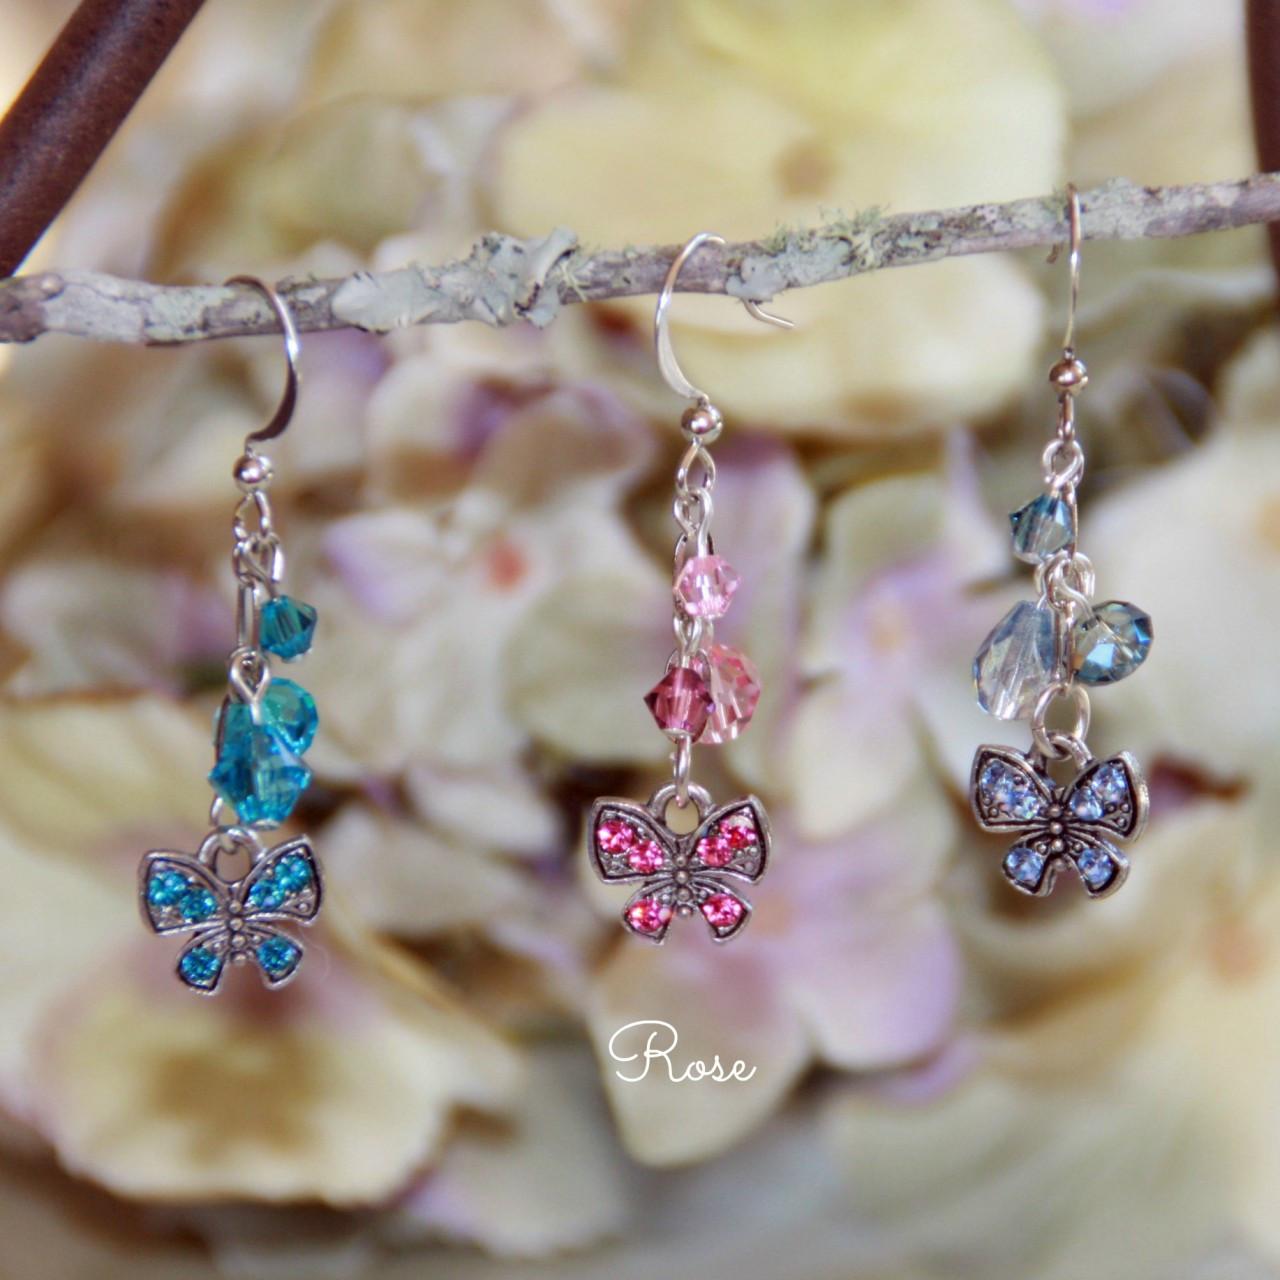 AER-26 Butterfly Crystal Earrings Rose Swarovski